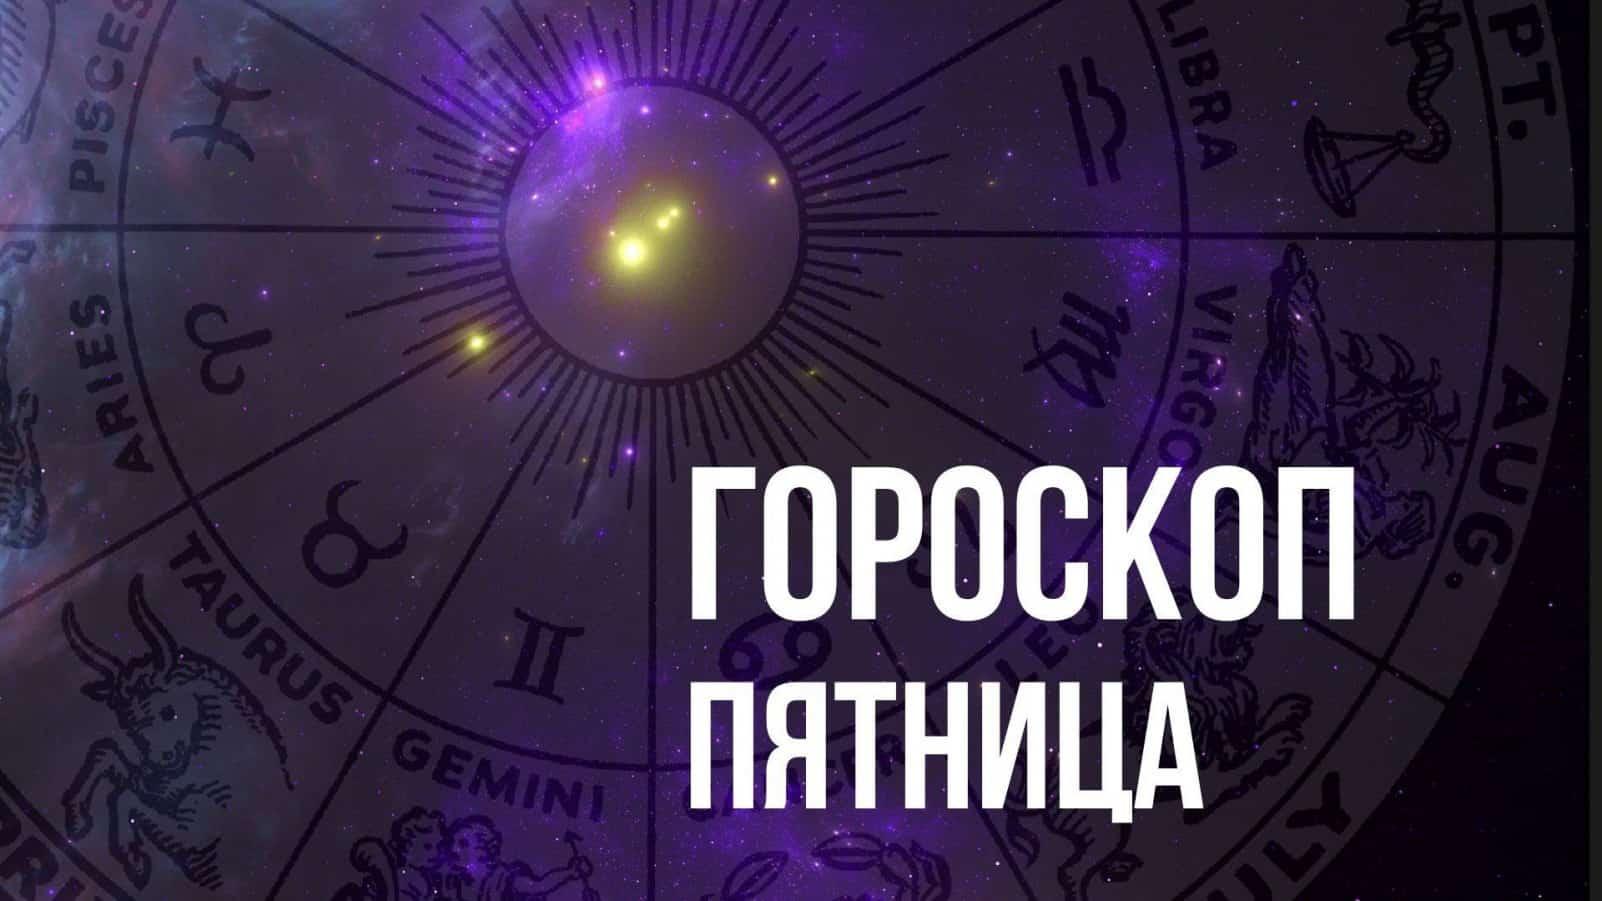 Гороскоп на пятницу 13 августа для каждого знака Зодиака